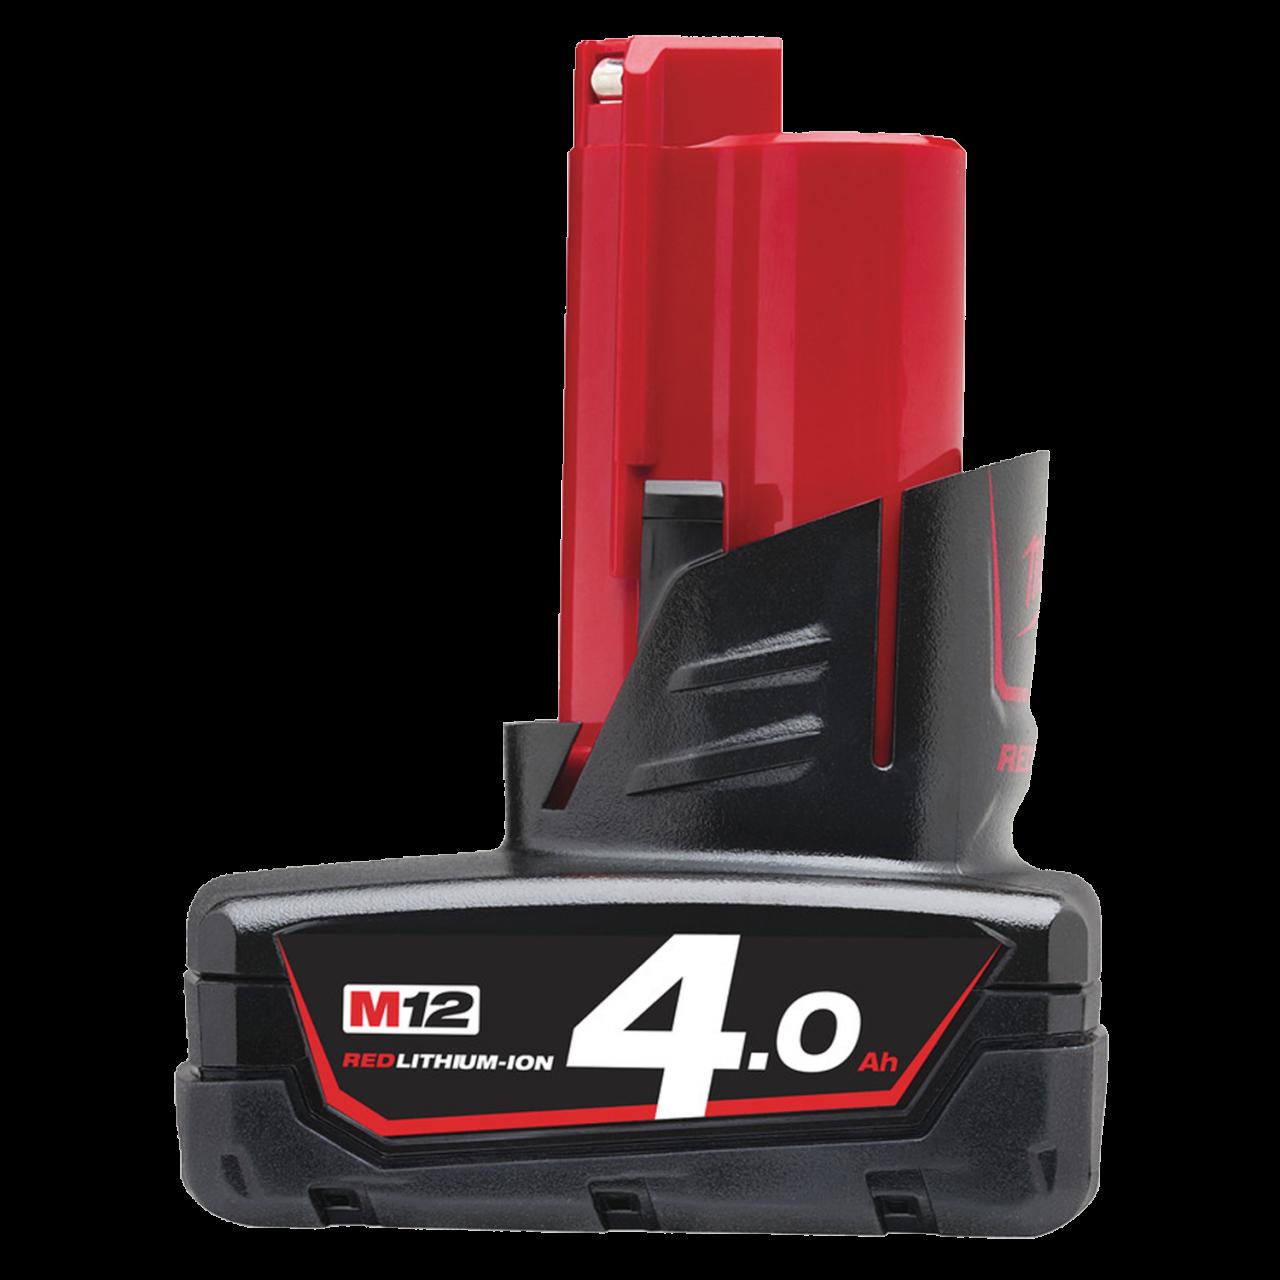 Milwaukee M12 B4 Akku 12V 4.0 AH Red Lithium